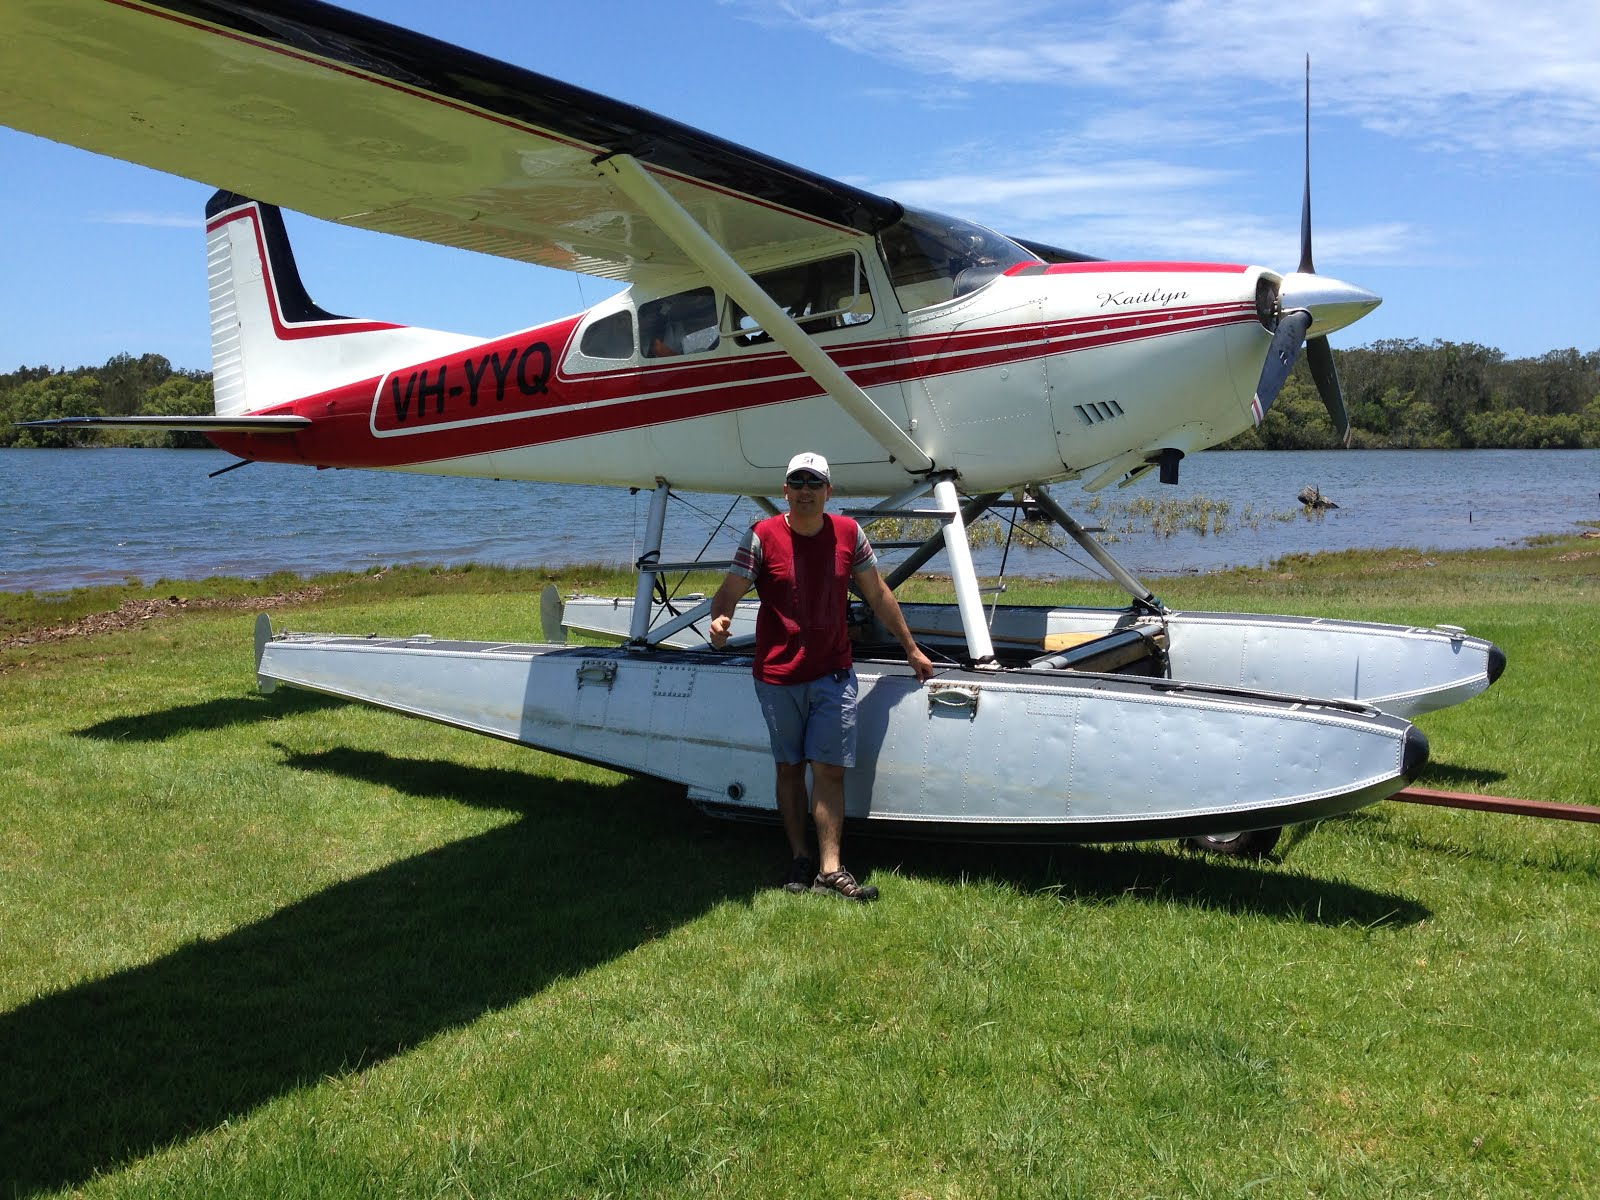 Restoration of a Cessna 185 floatplane: April 2016